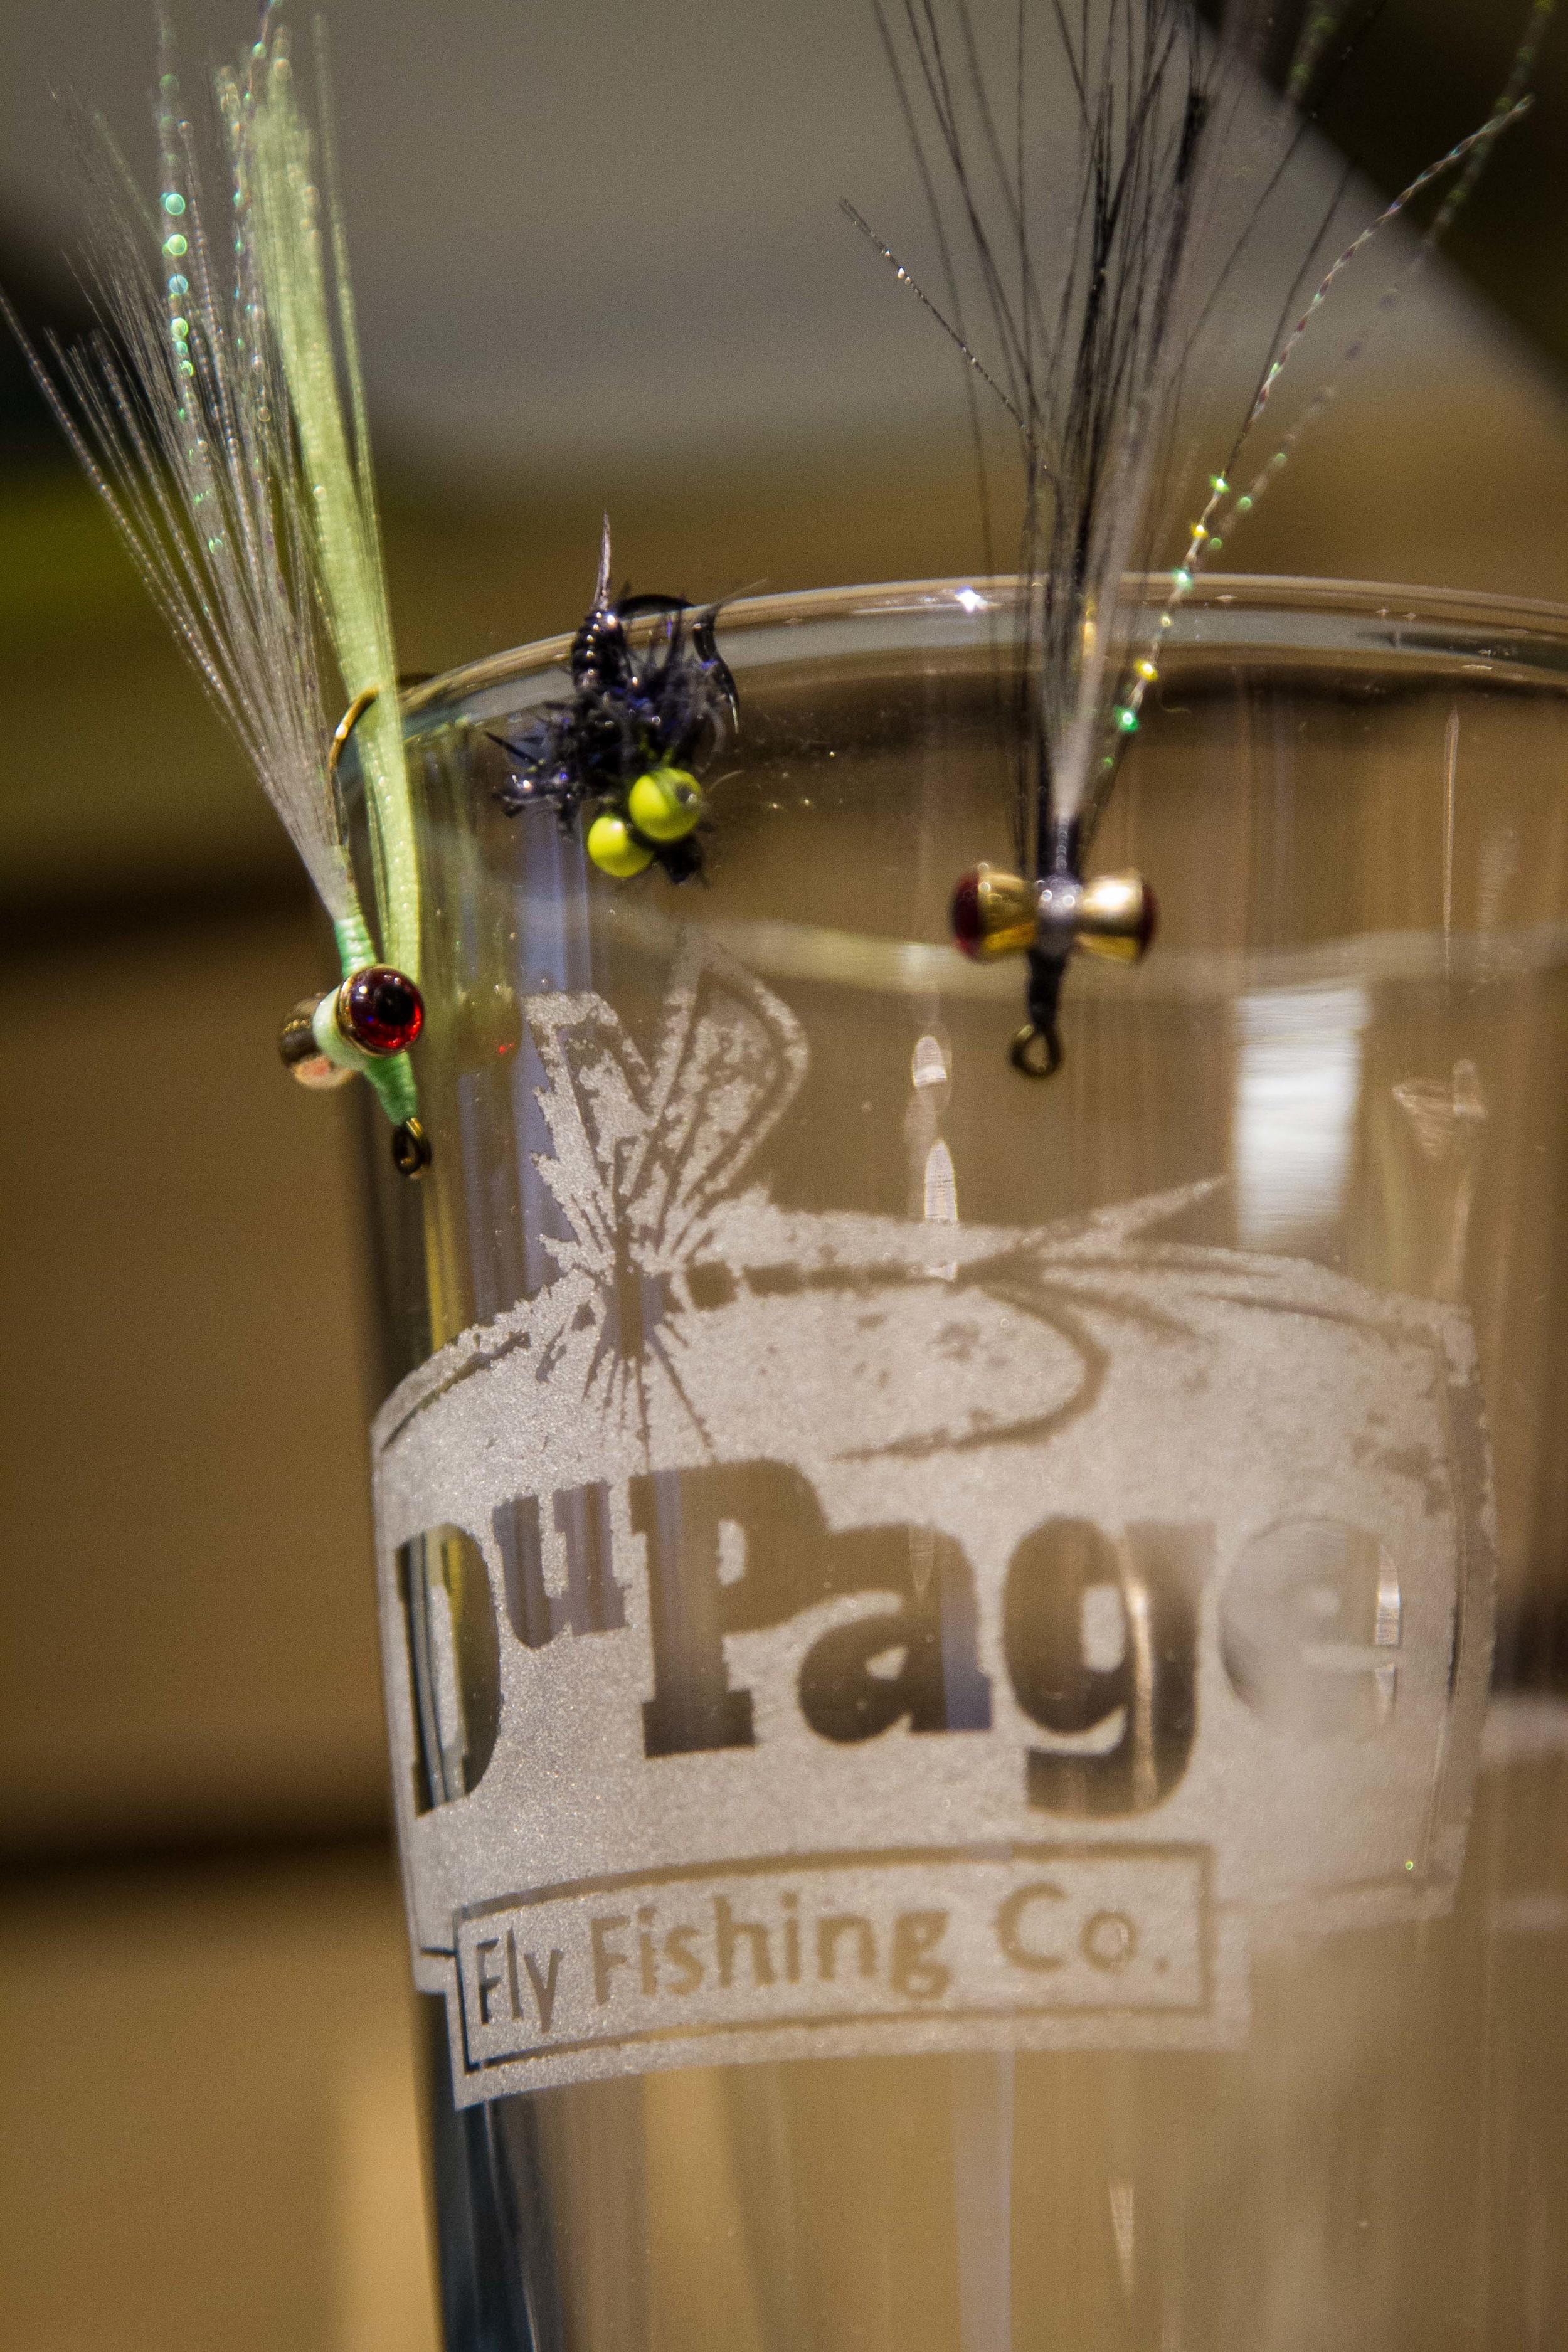 DuPage Fly4.jpg